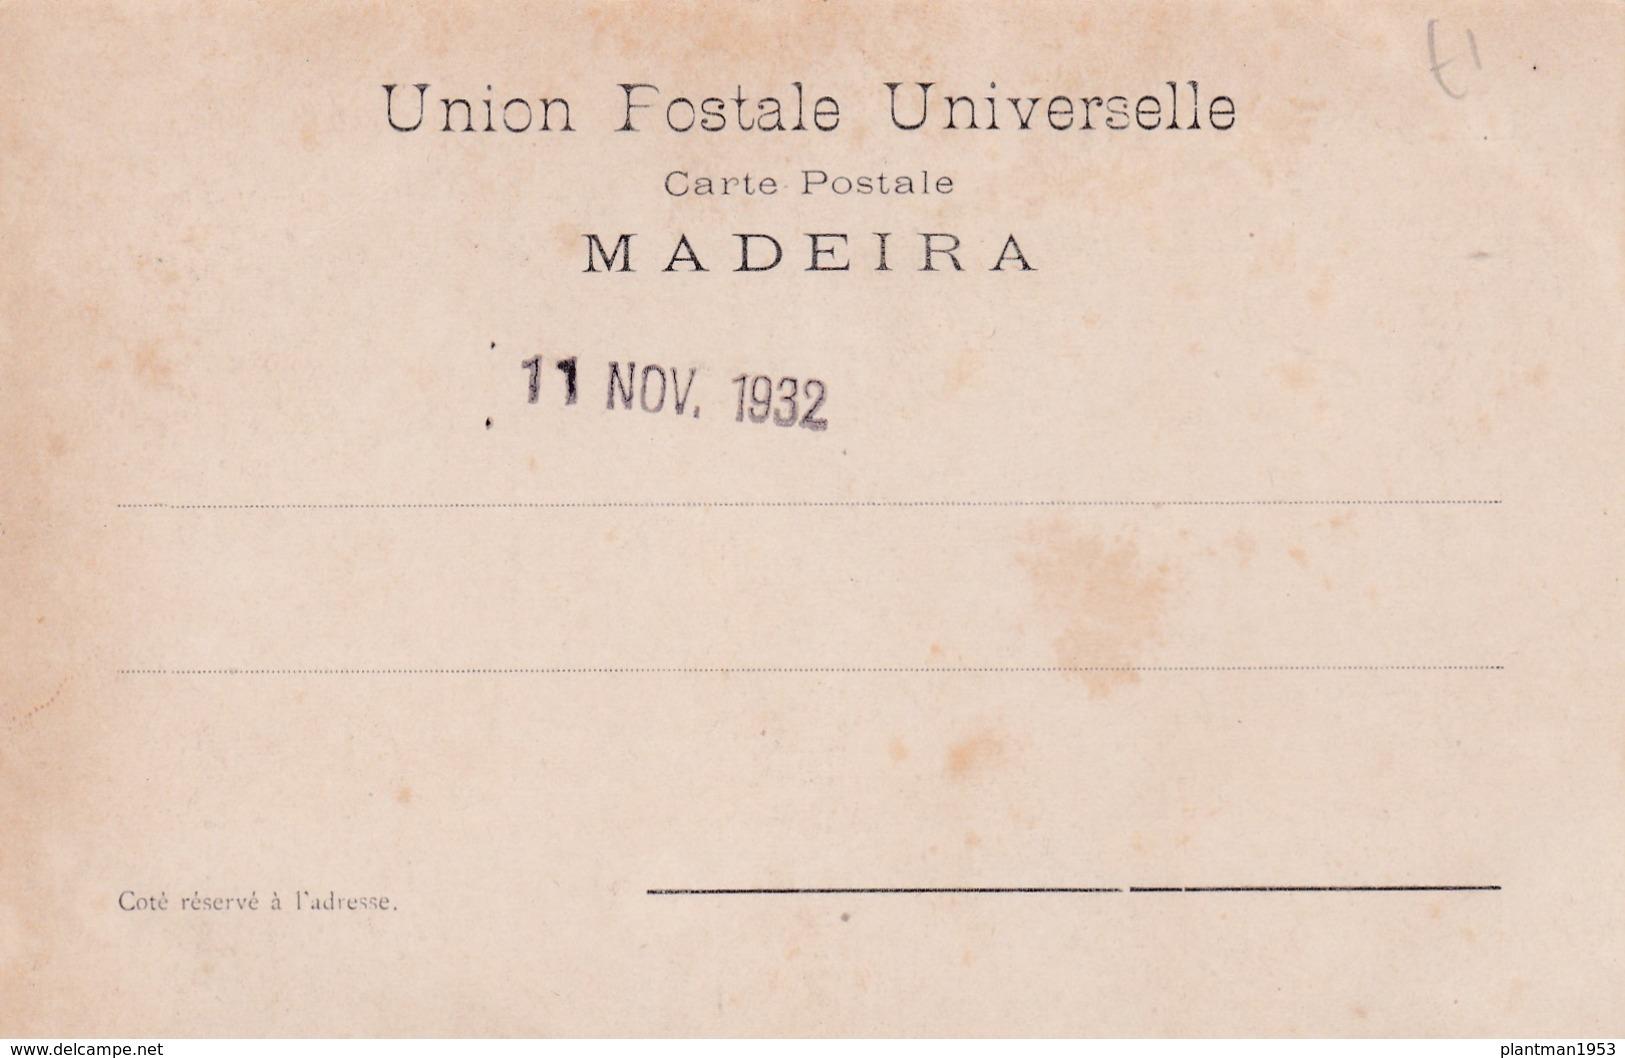 Old Post Card Of Caminho Do Monte,Funchal Madeira, Portugal,R78. - Madeira